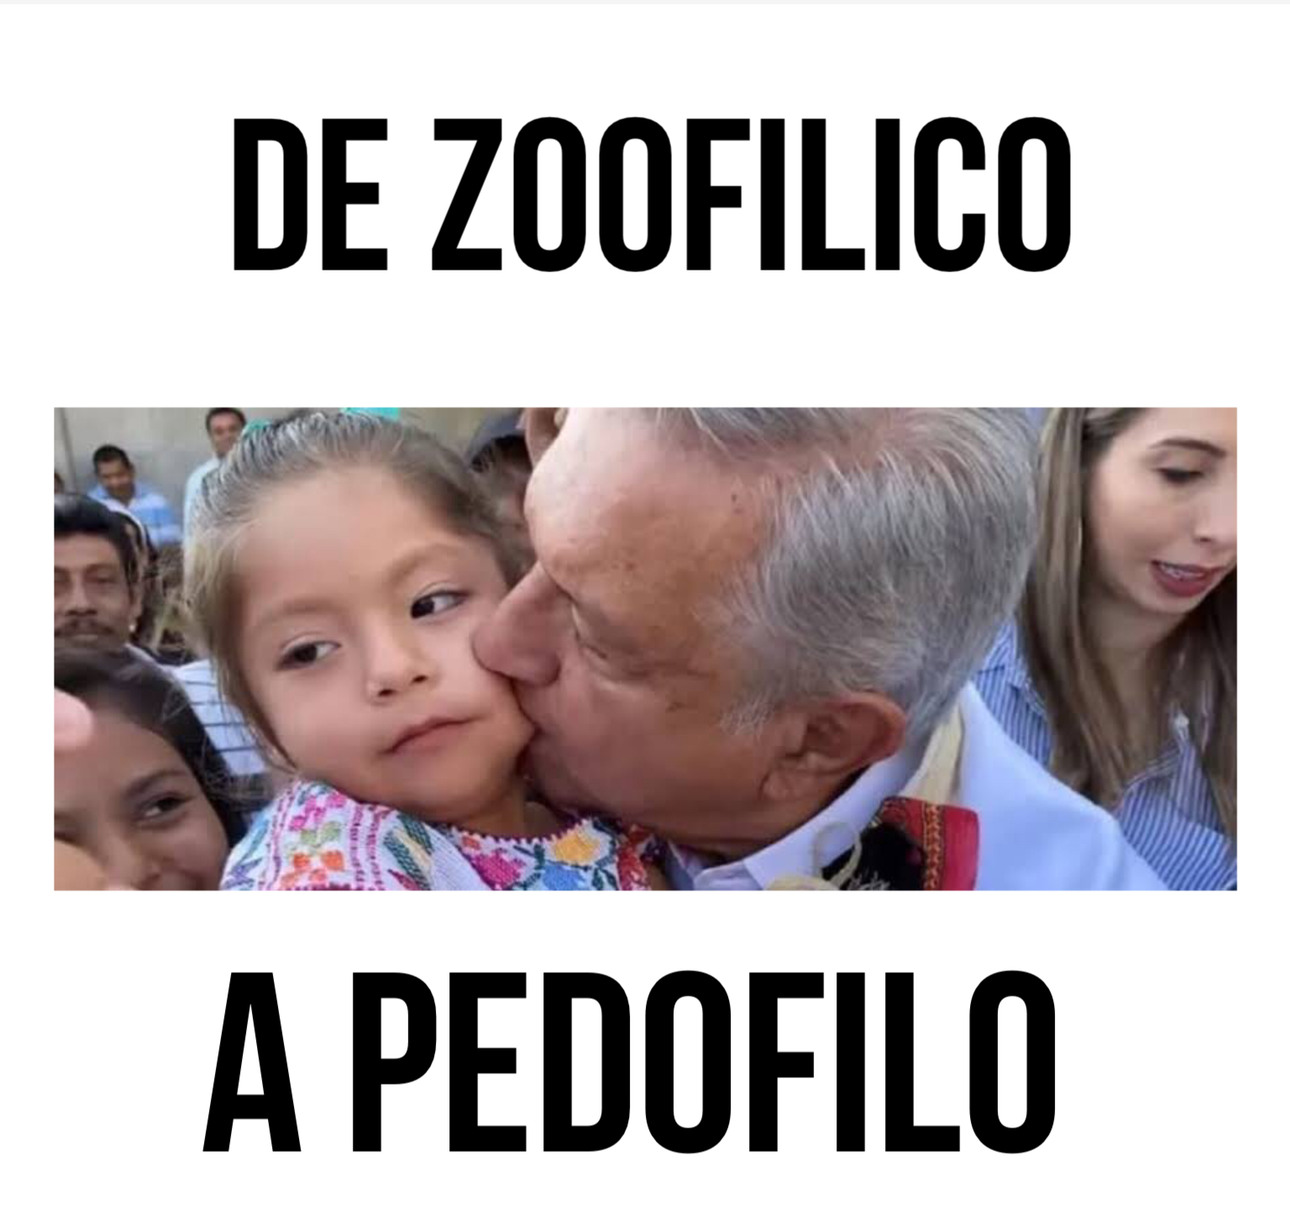 Pedofilo o canival ??? - meme